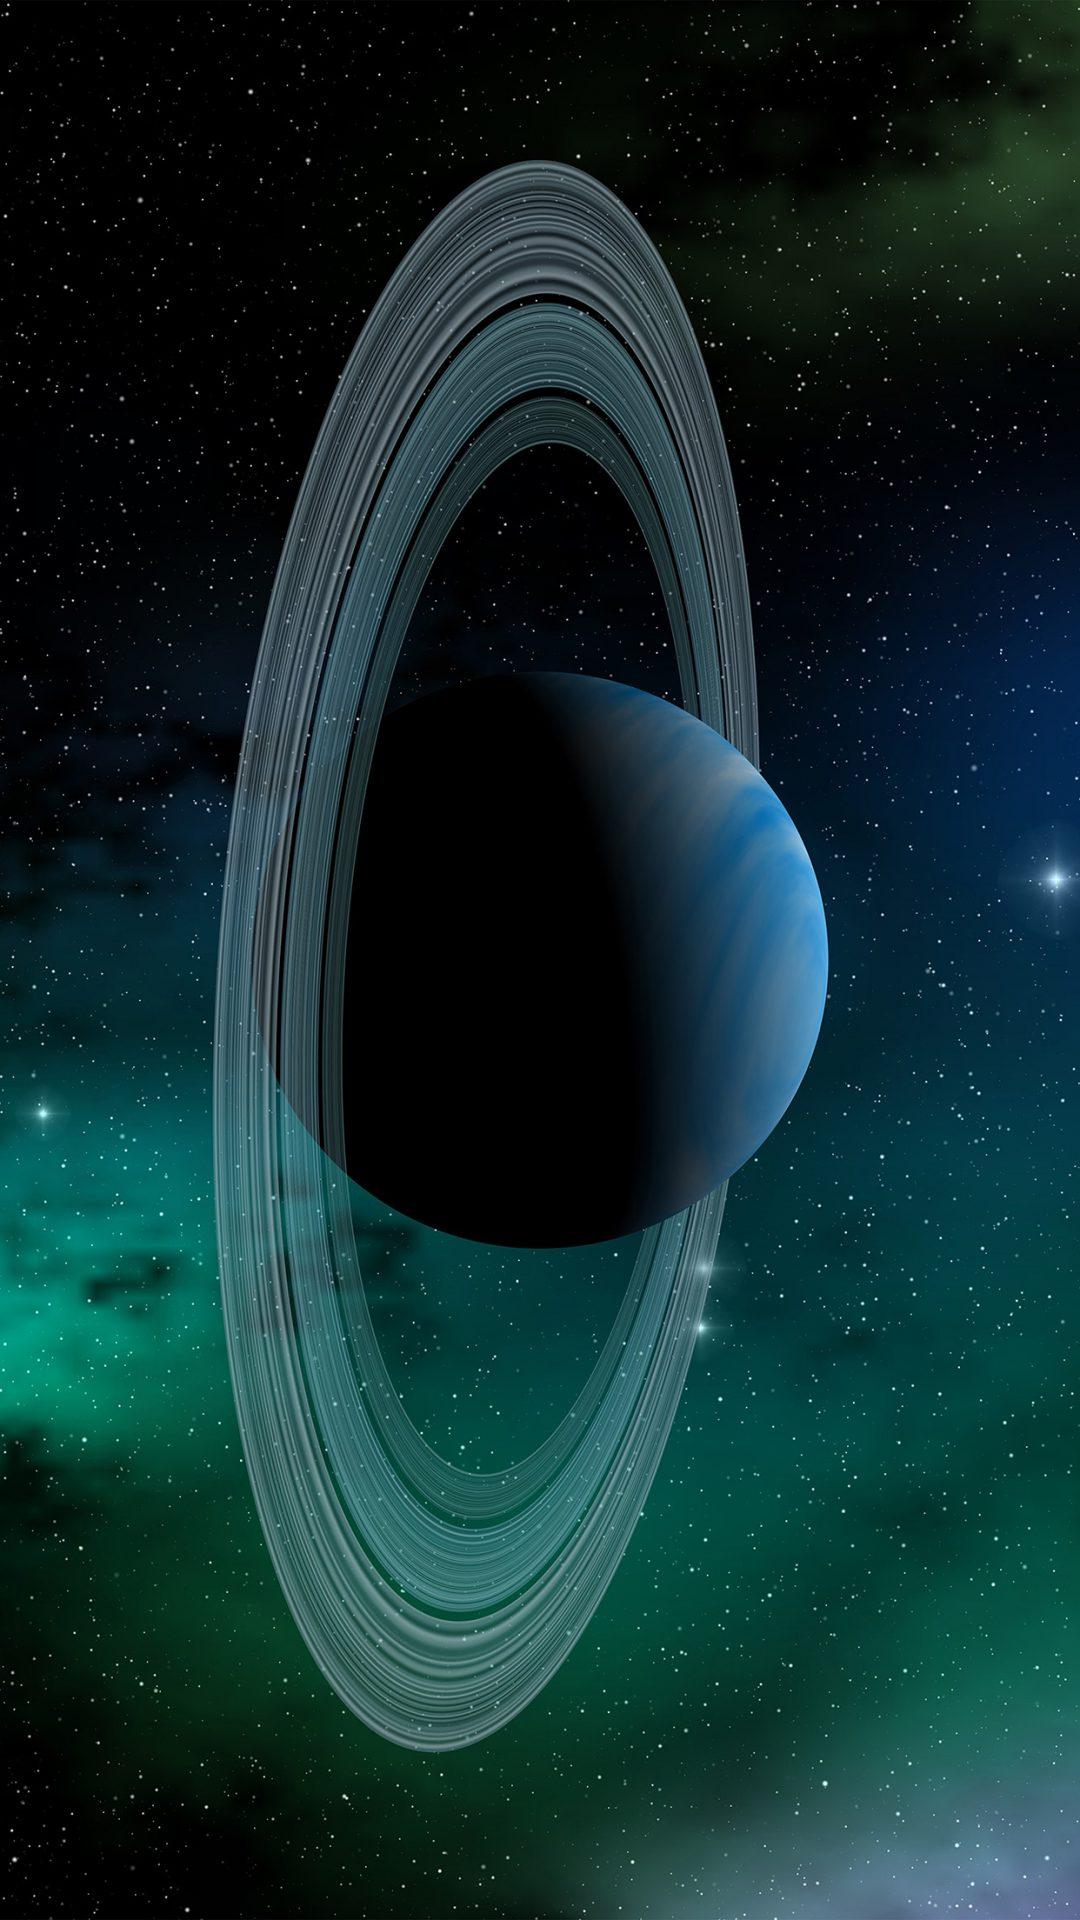 Space Planet Saturn Blue Star Art Illustration